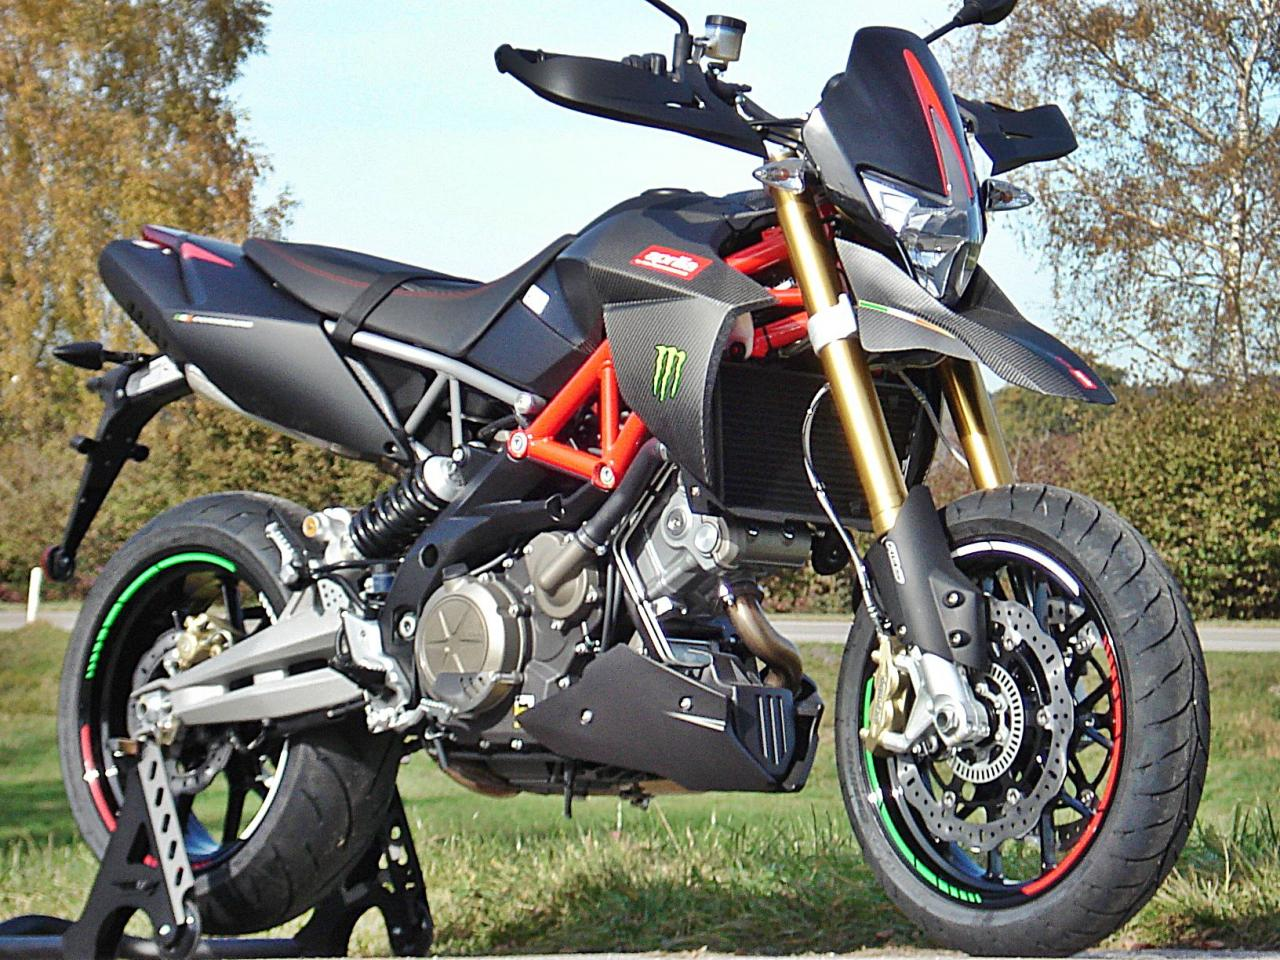 Aprilia Italy  City pictures : Aprilia Dorsoduro RSI Italy Monster Design Motorrad Fotos & Motorrad ...